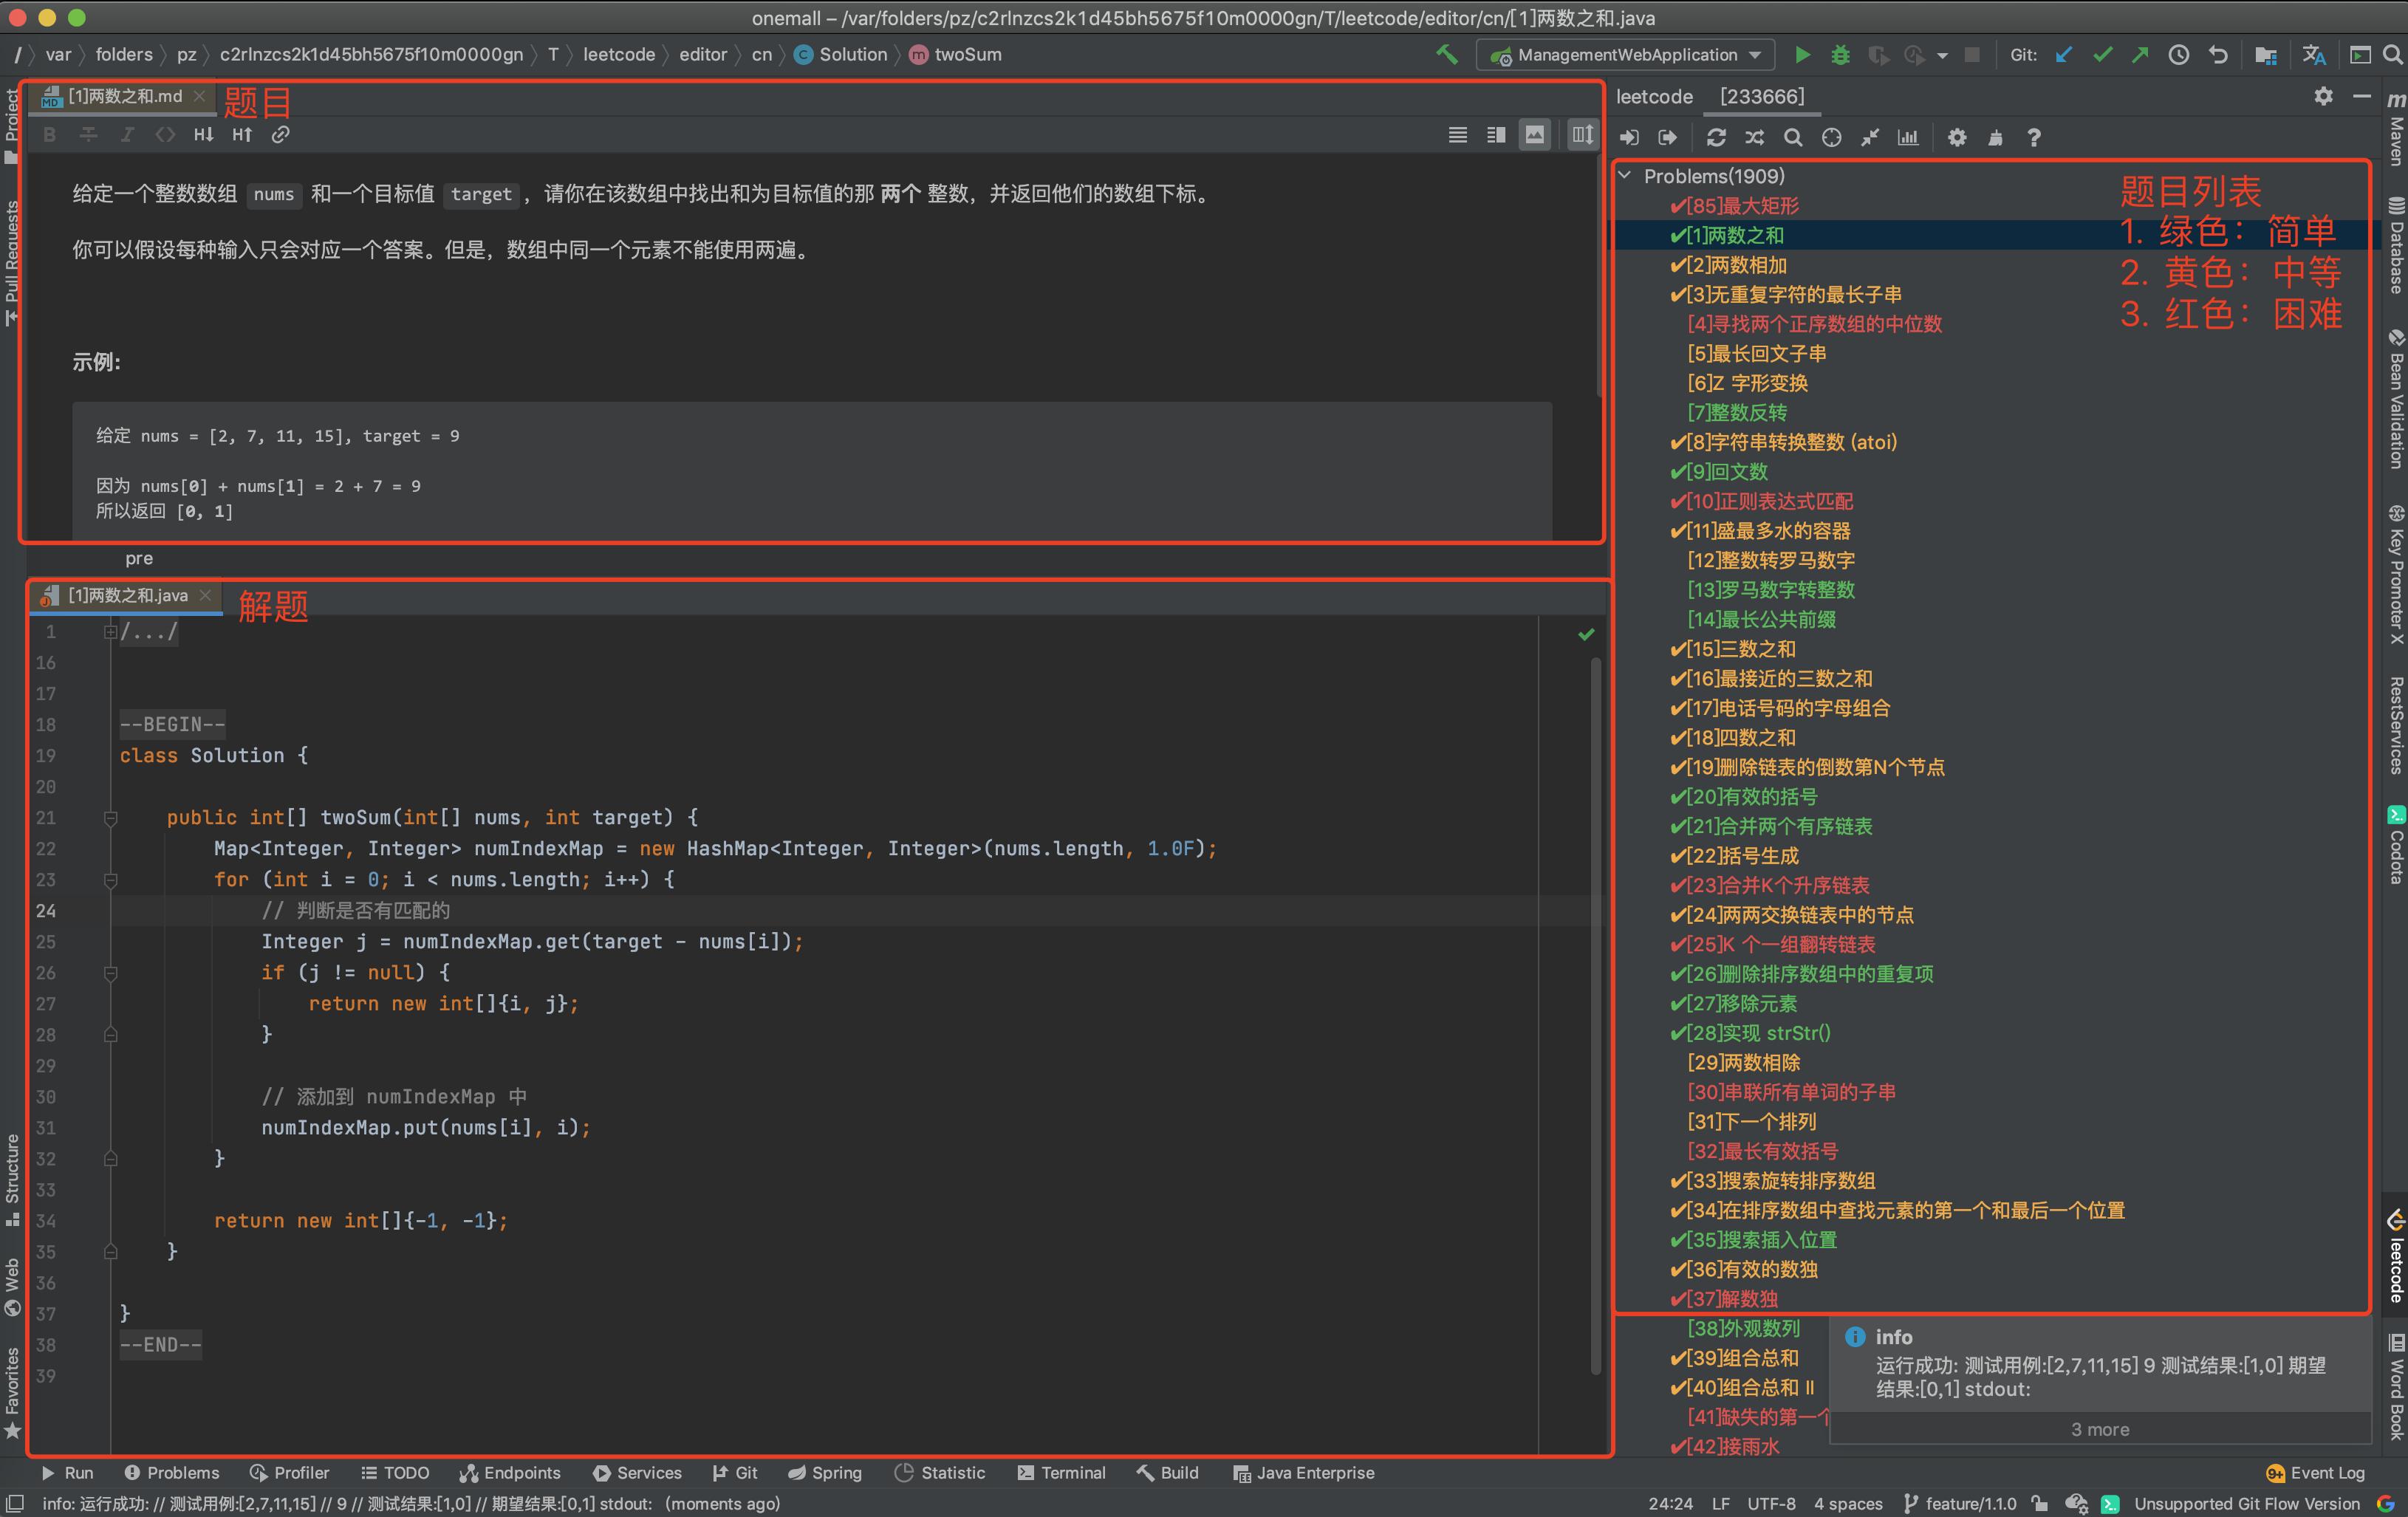 LeetCode Editor 效果